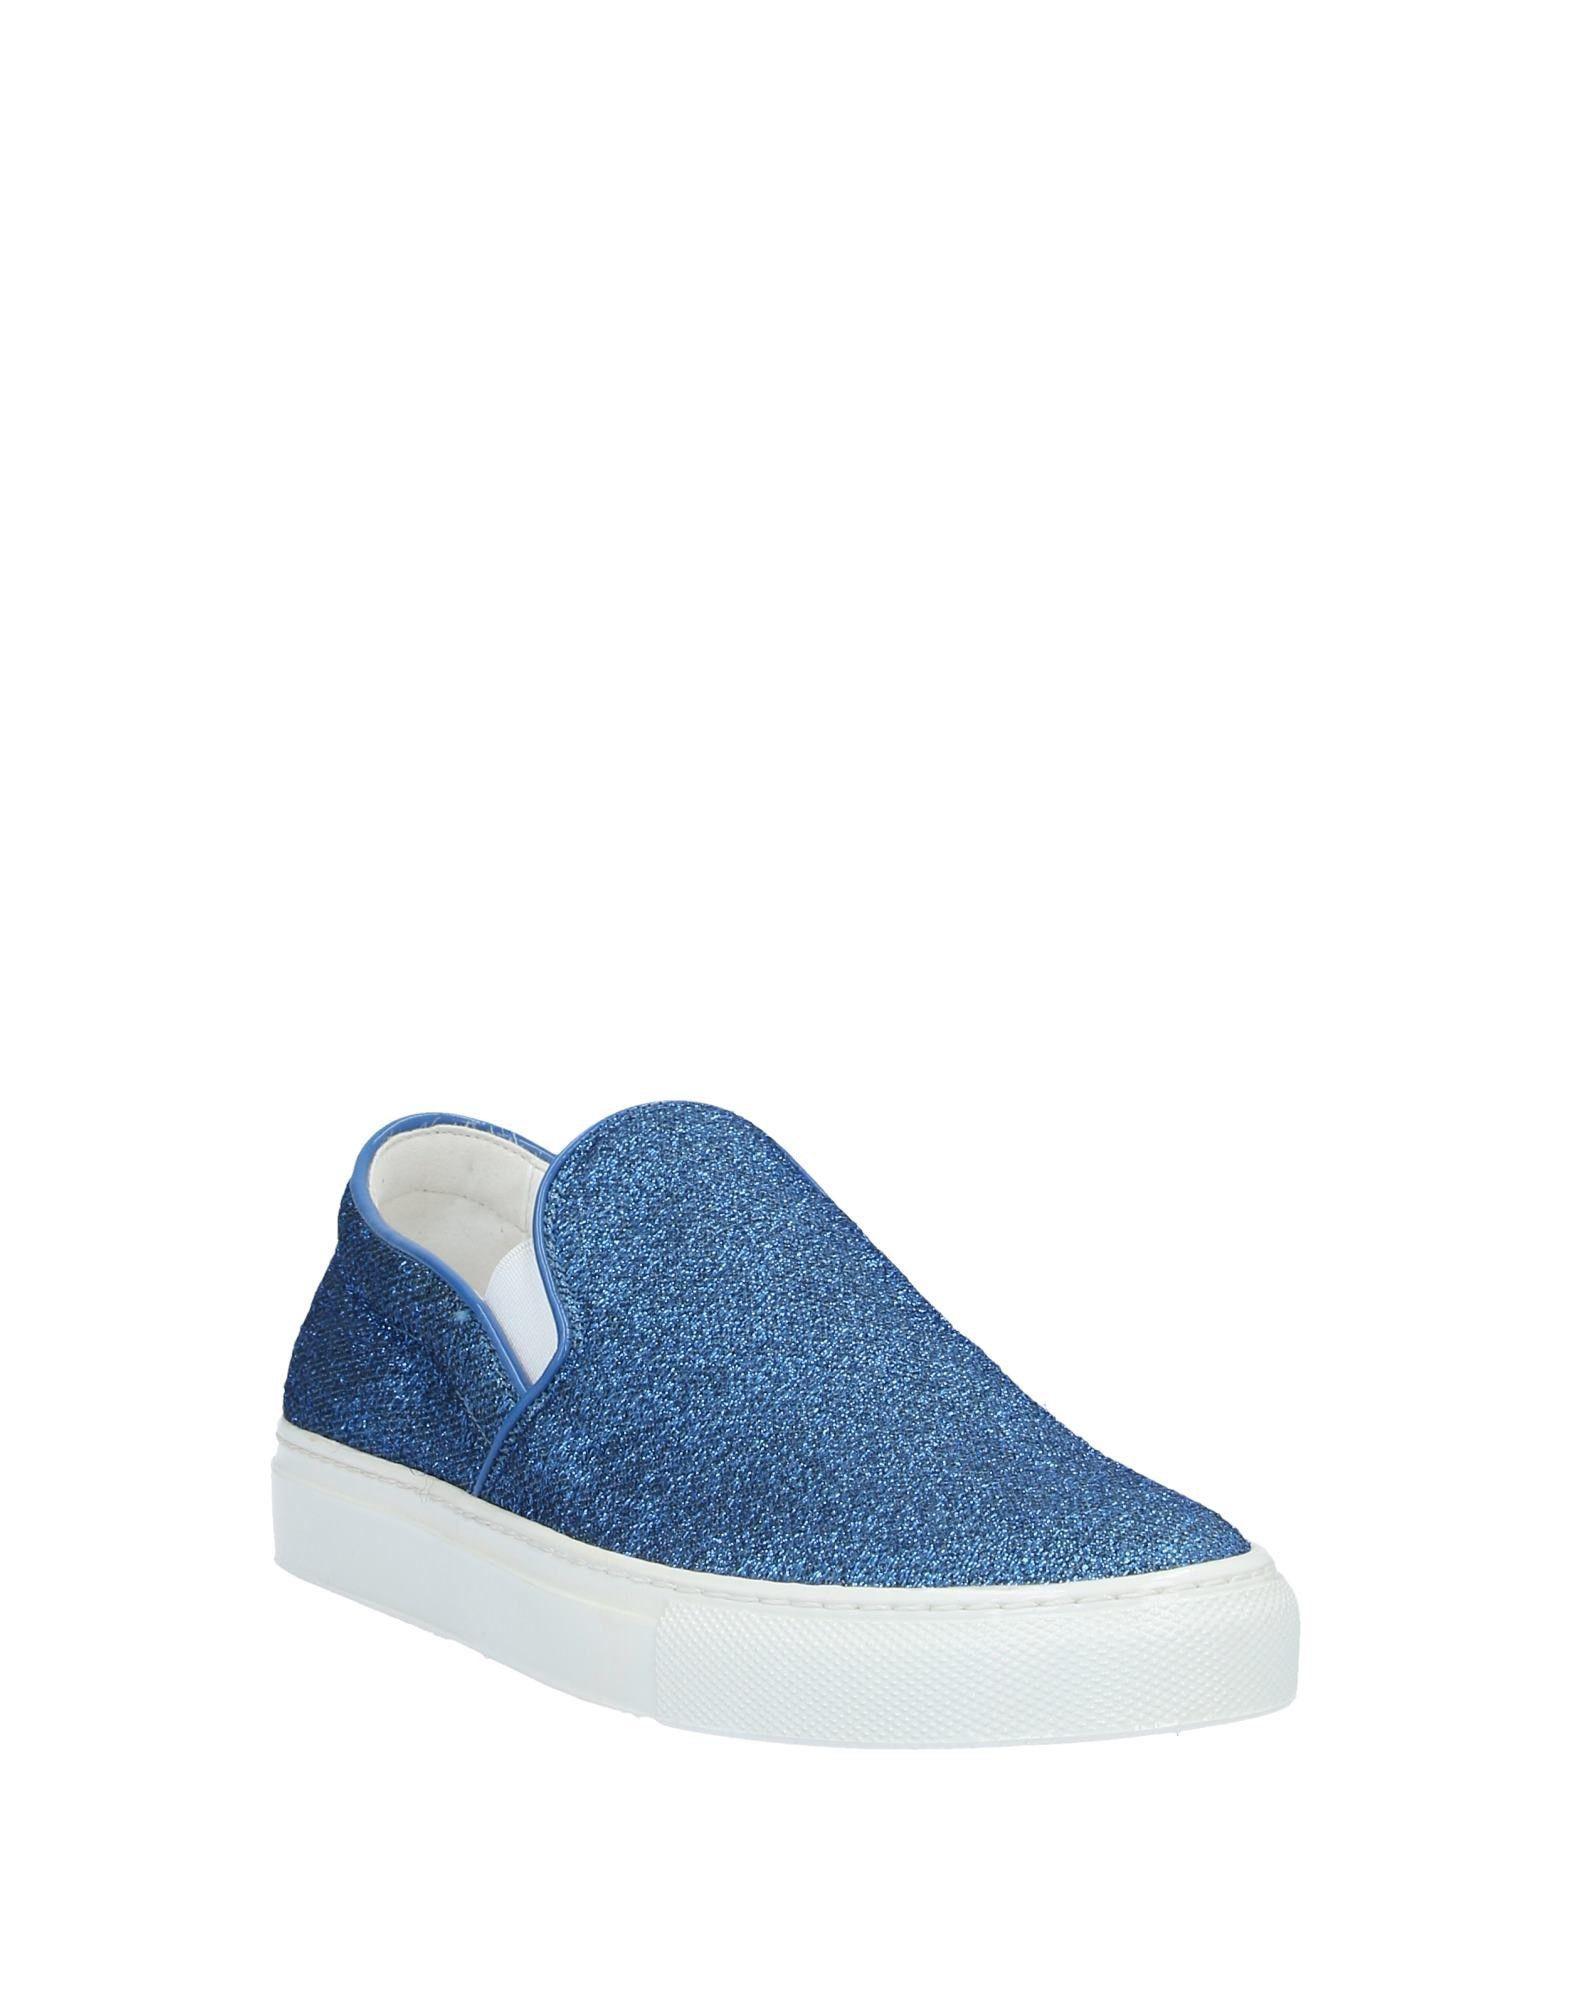 Sneakers & Deportivas L'Autre Chose de Cuero de color Azul